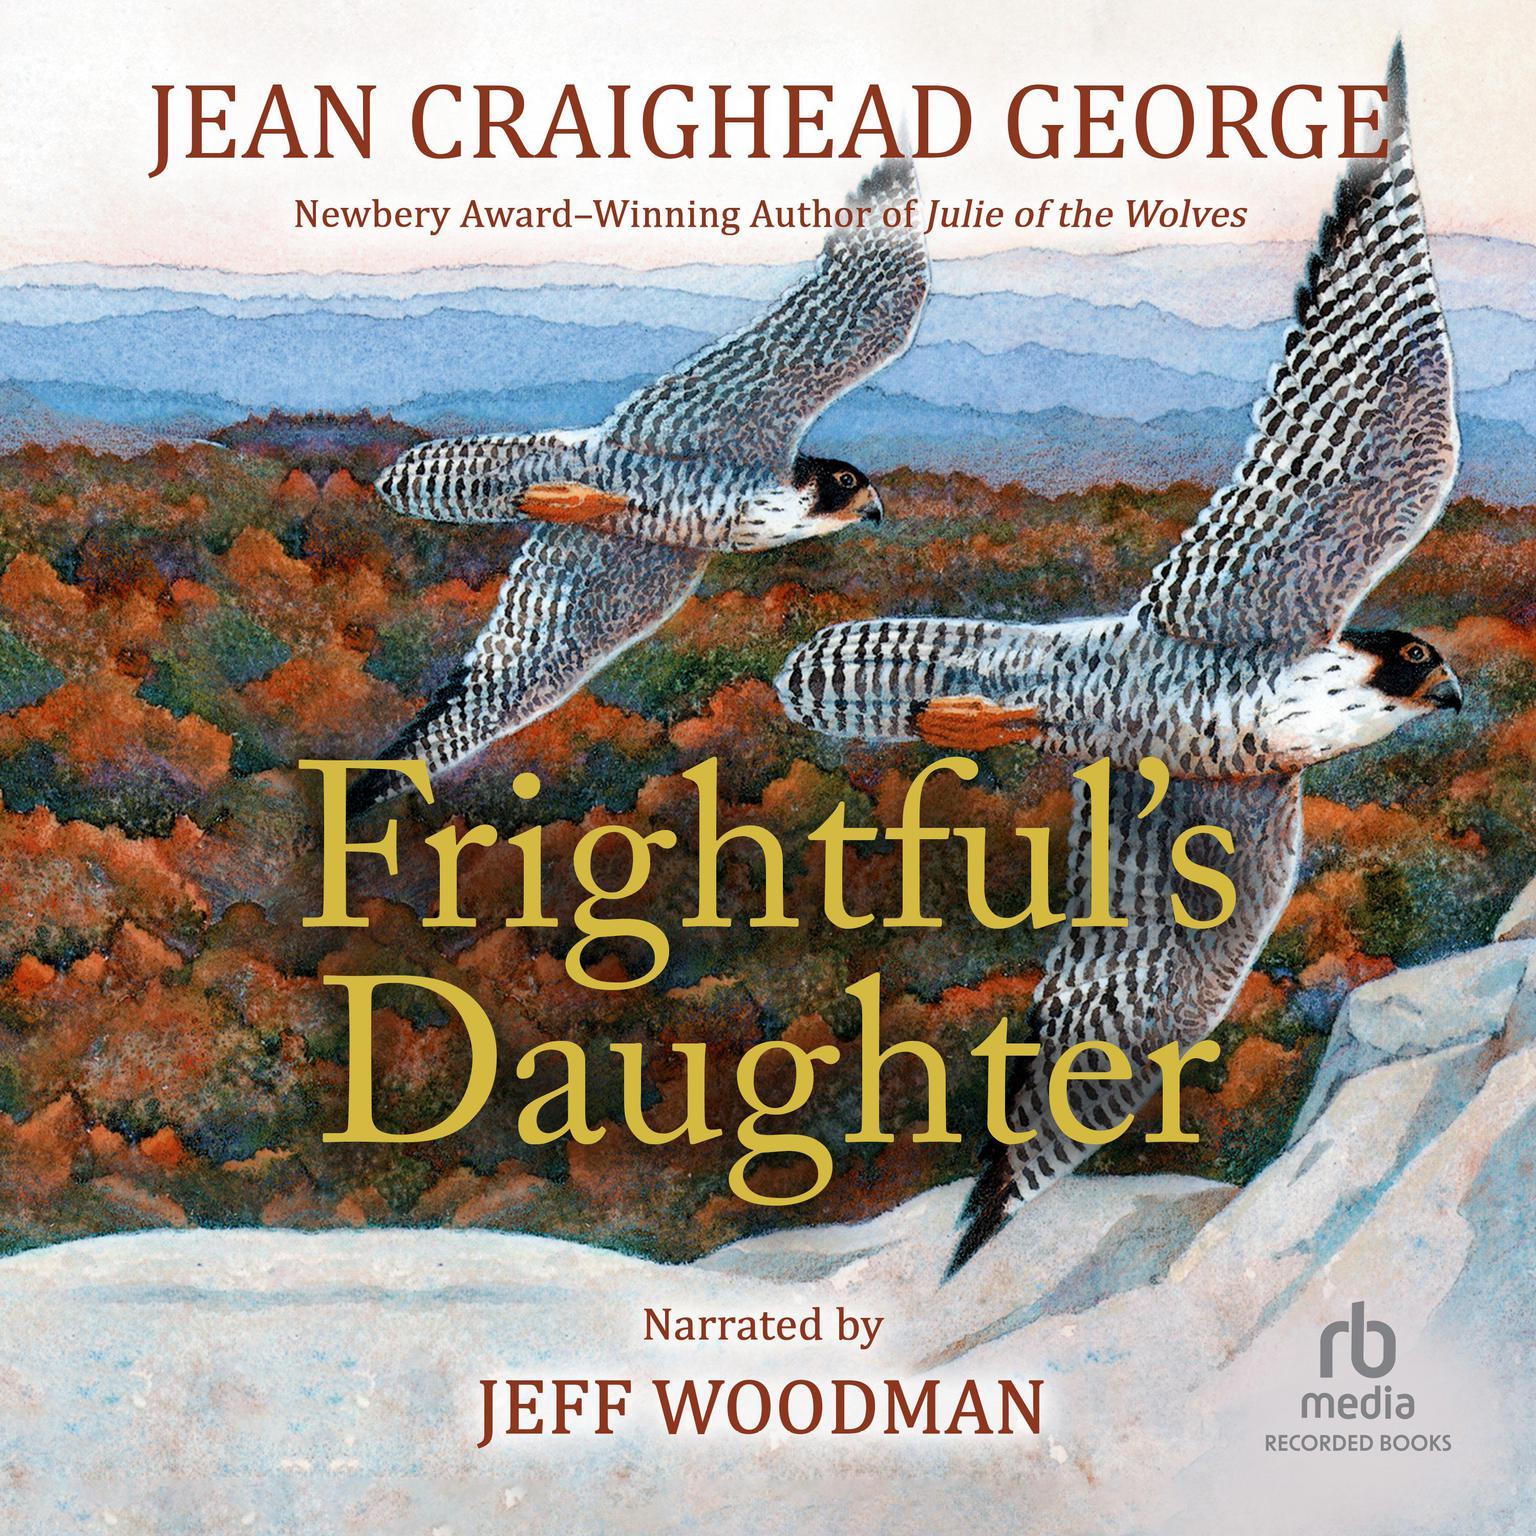 Frightfuls Daughter Audiobook, by Jean Craighead George